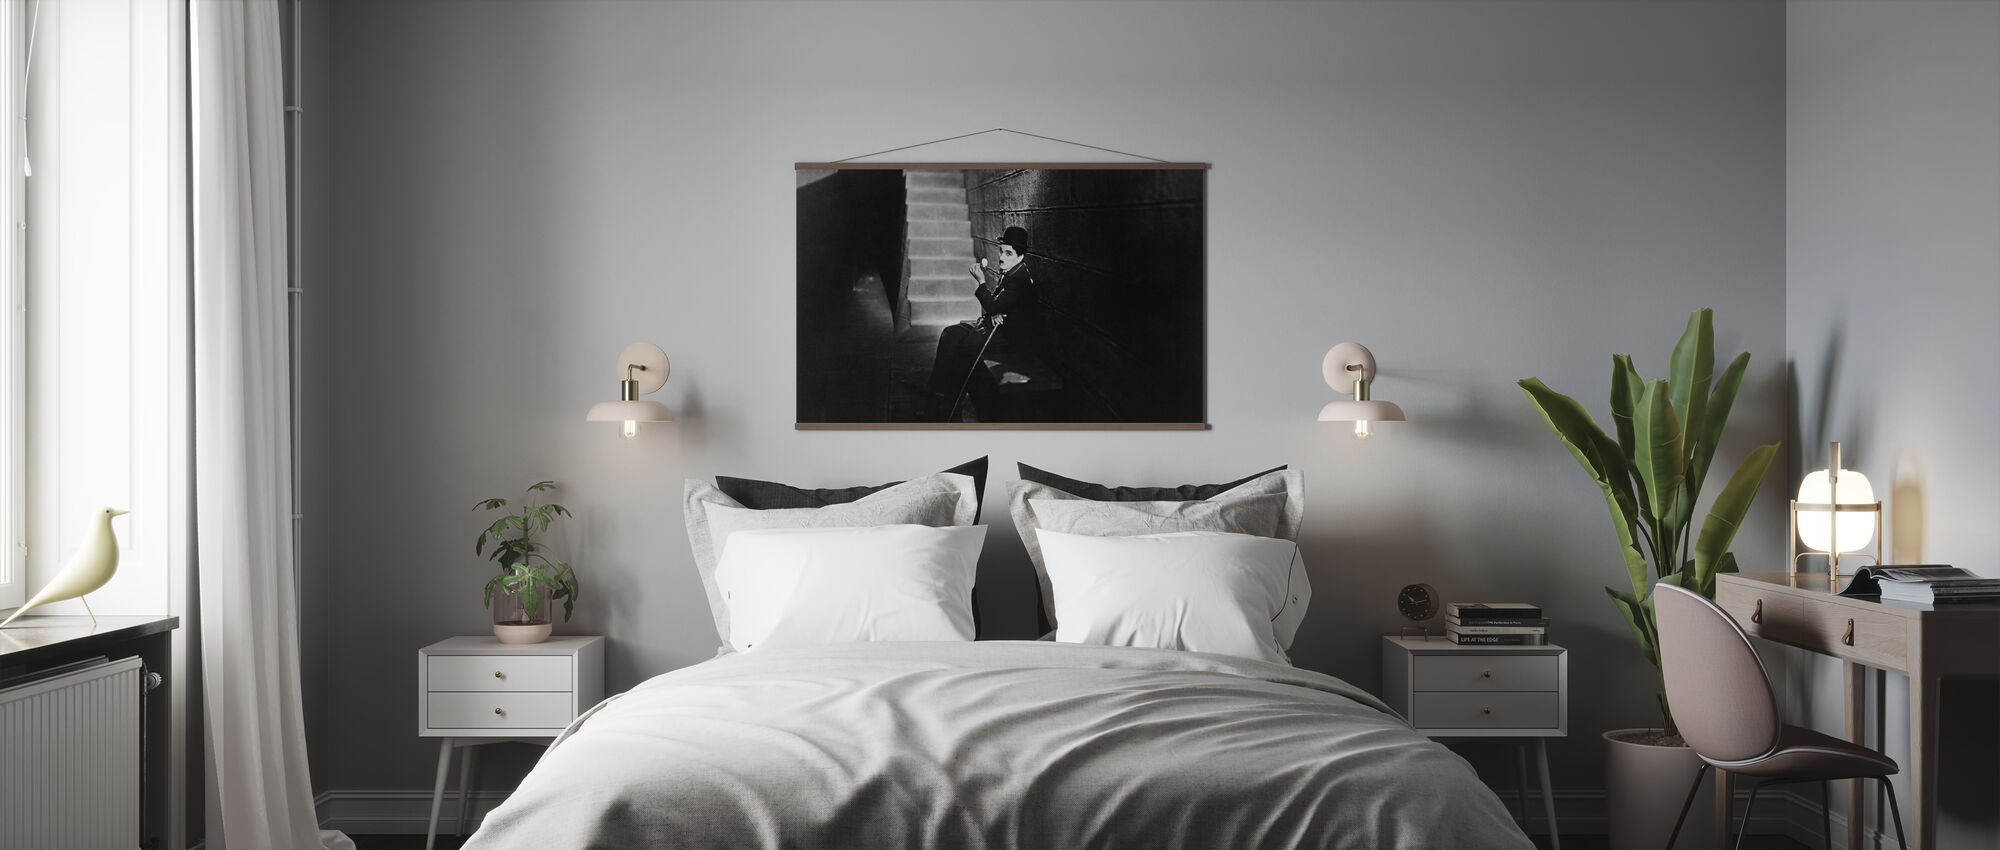 City Lights - Charlie Chaplin - Poster - Bedroom